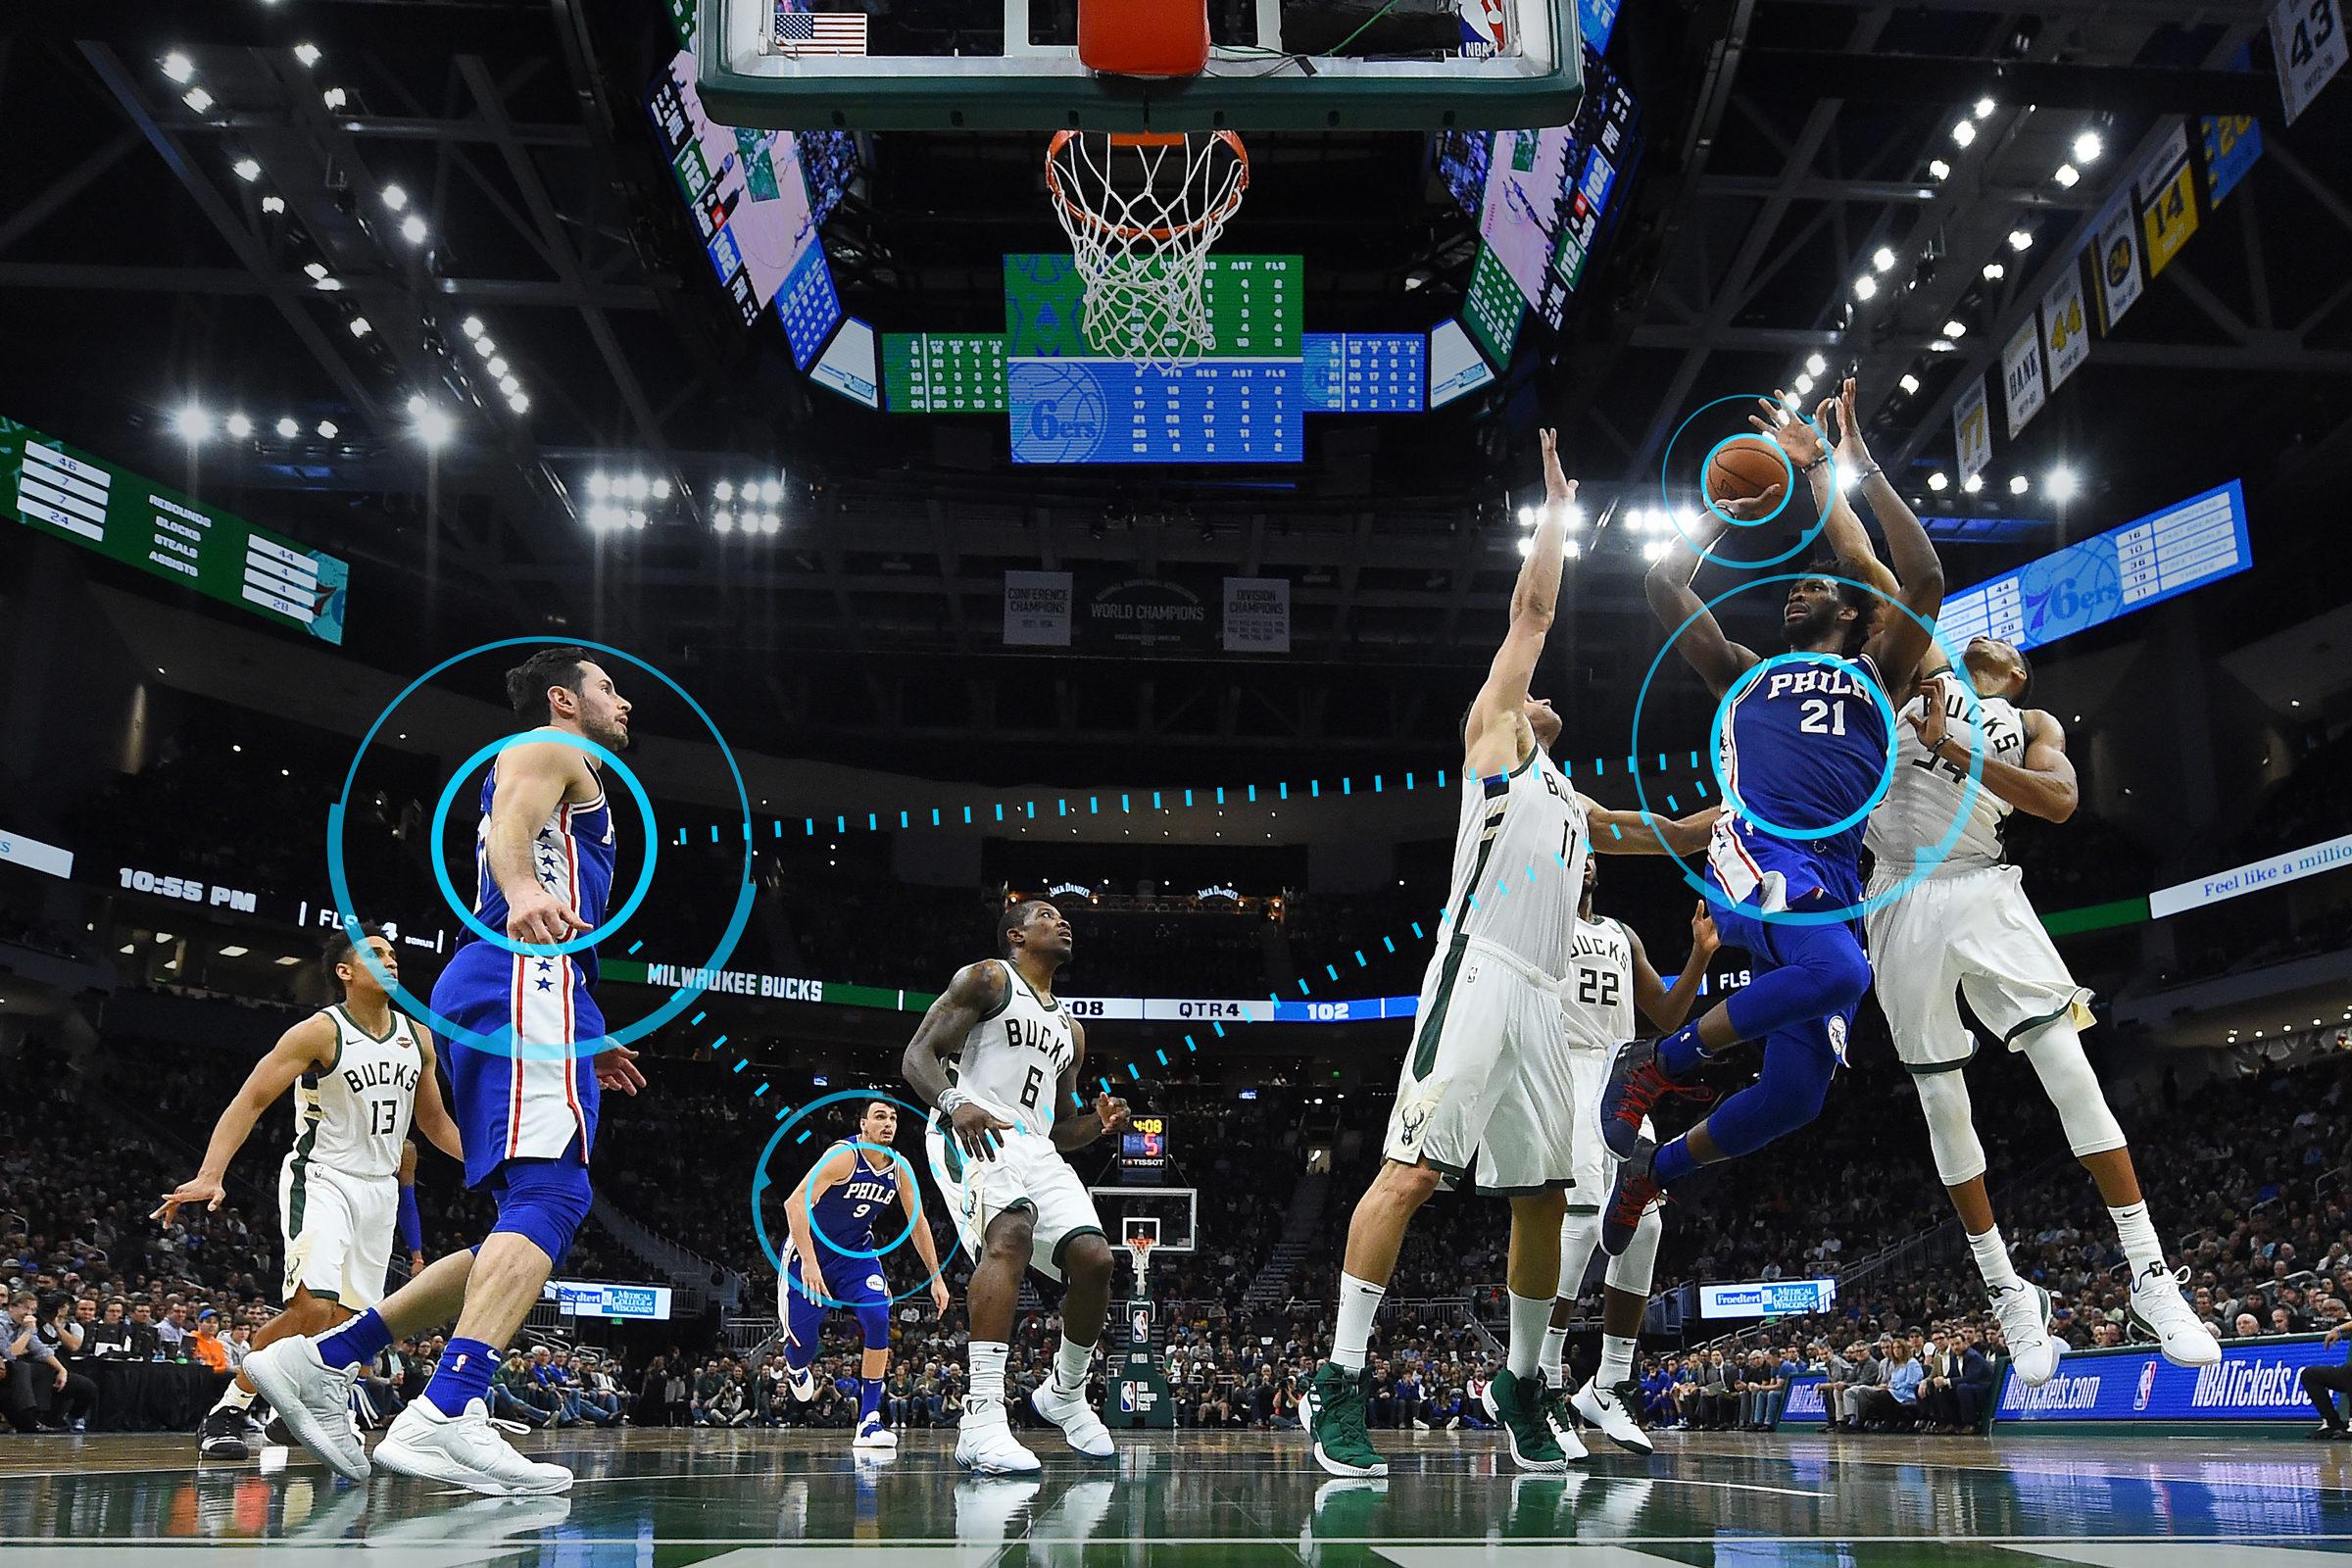 Philadelphia 76ers vs Milwaukee Bucks game situation